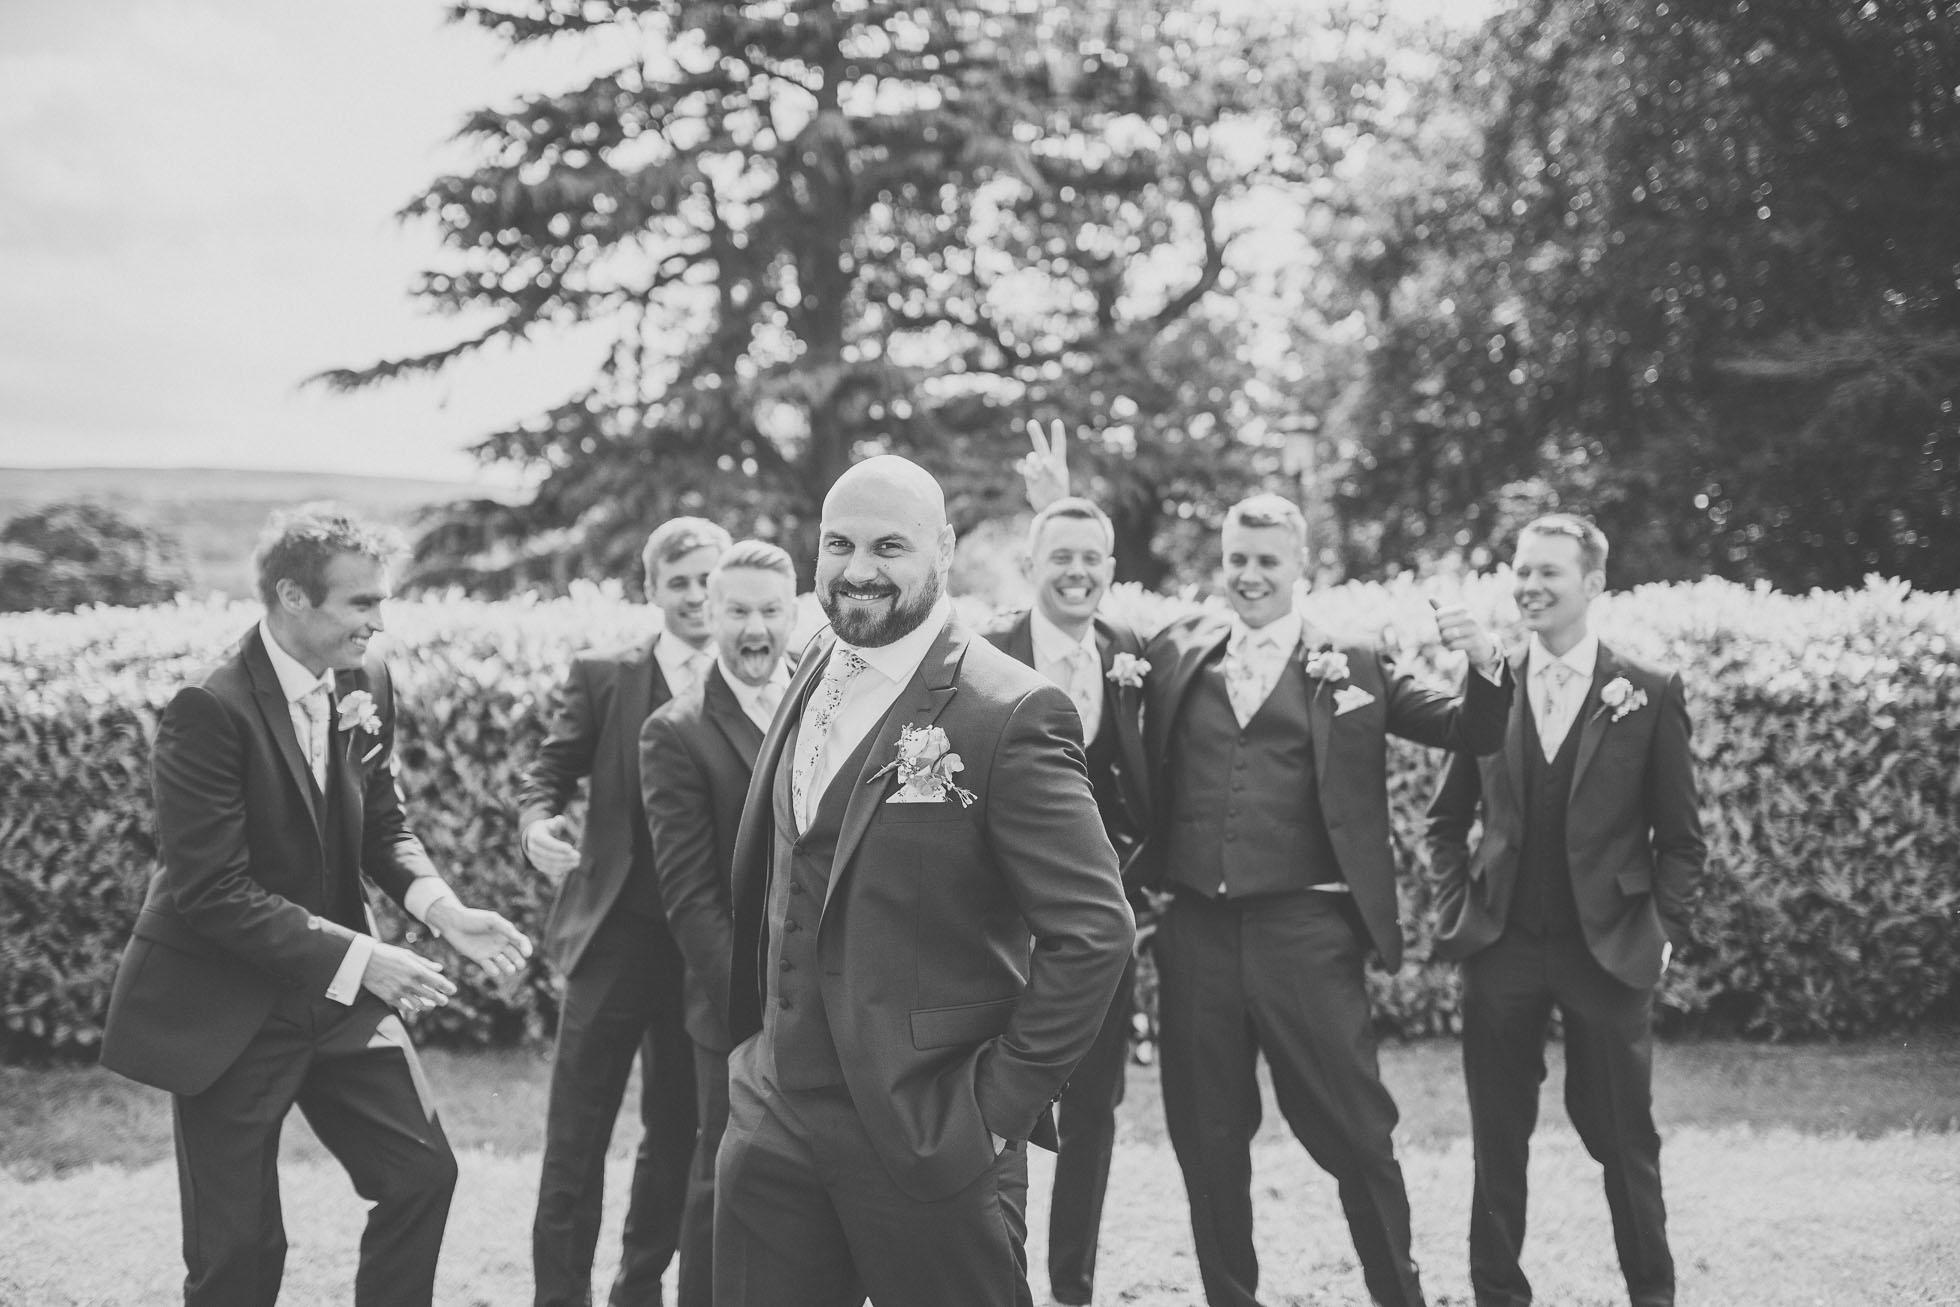 denton-hall-wedding-photographer-47.jpg